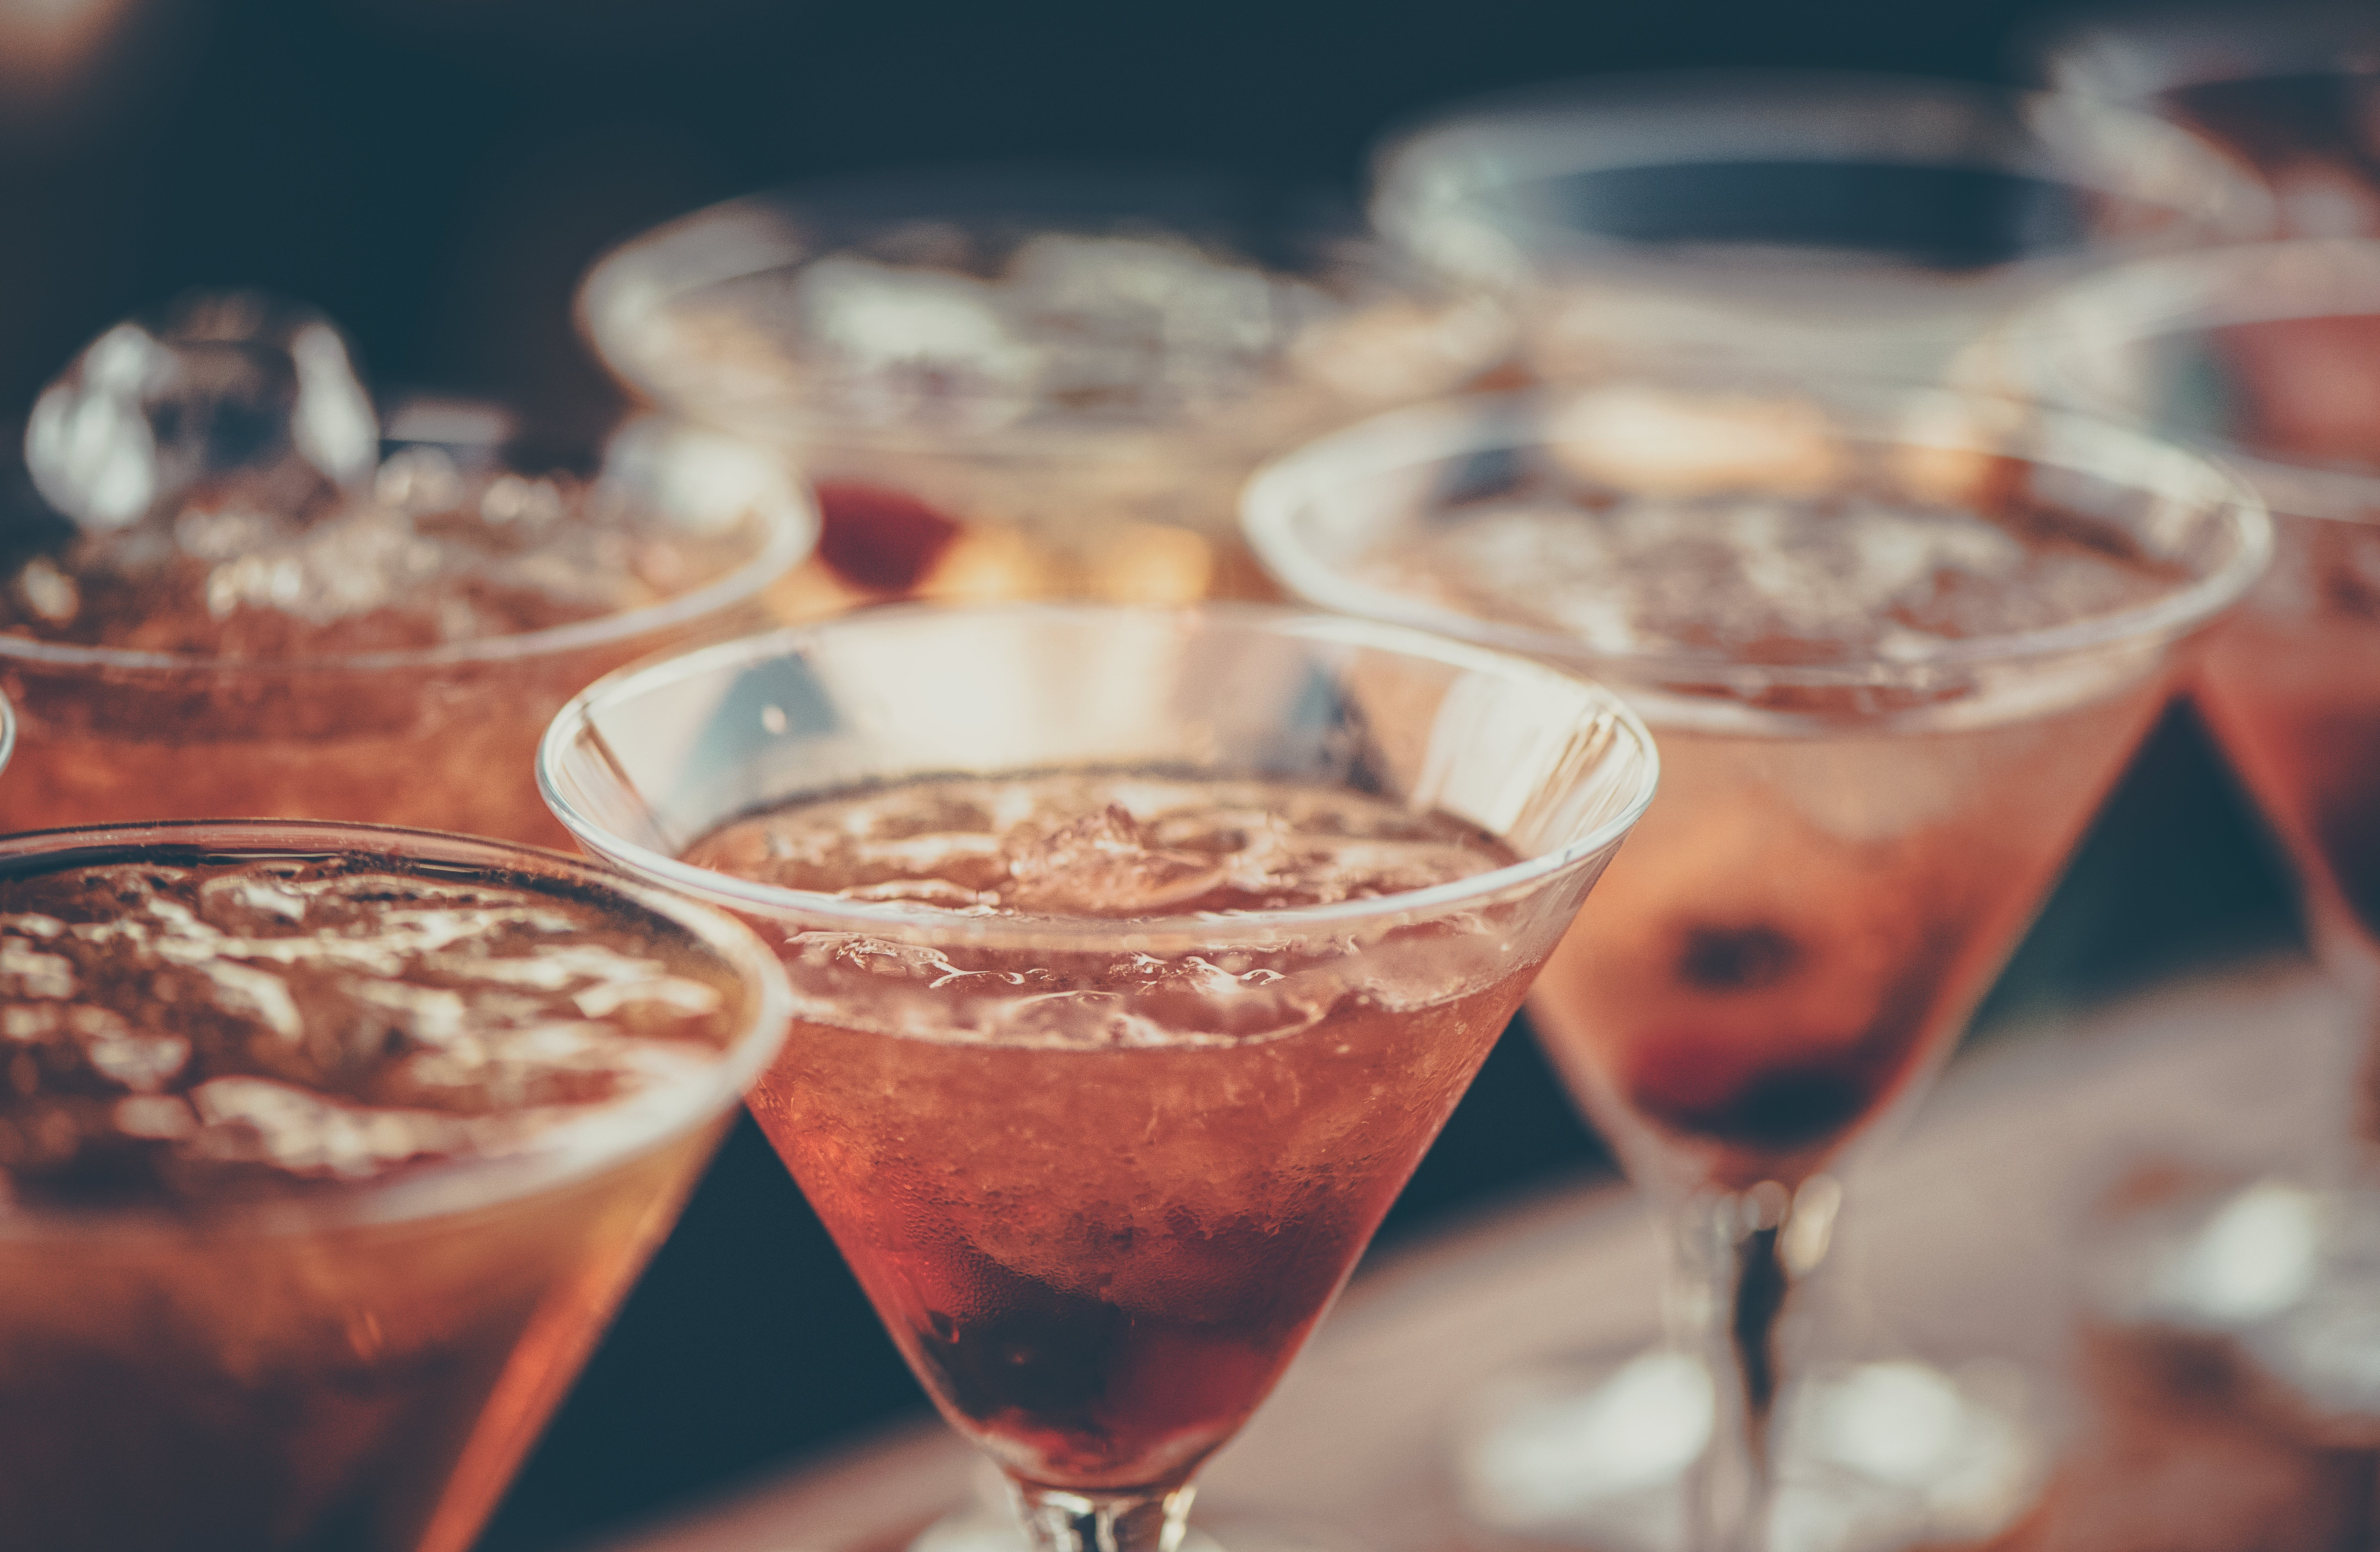 Margarita Glass in Shallow Photo